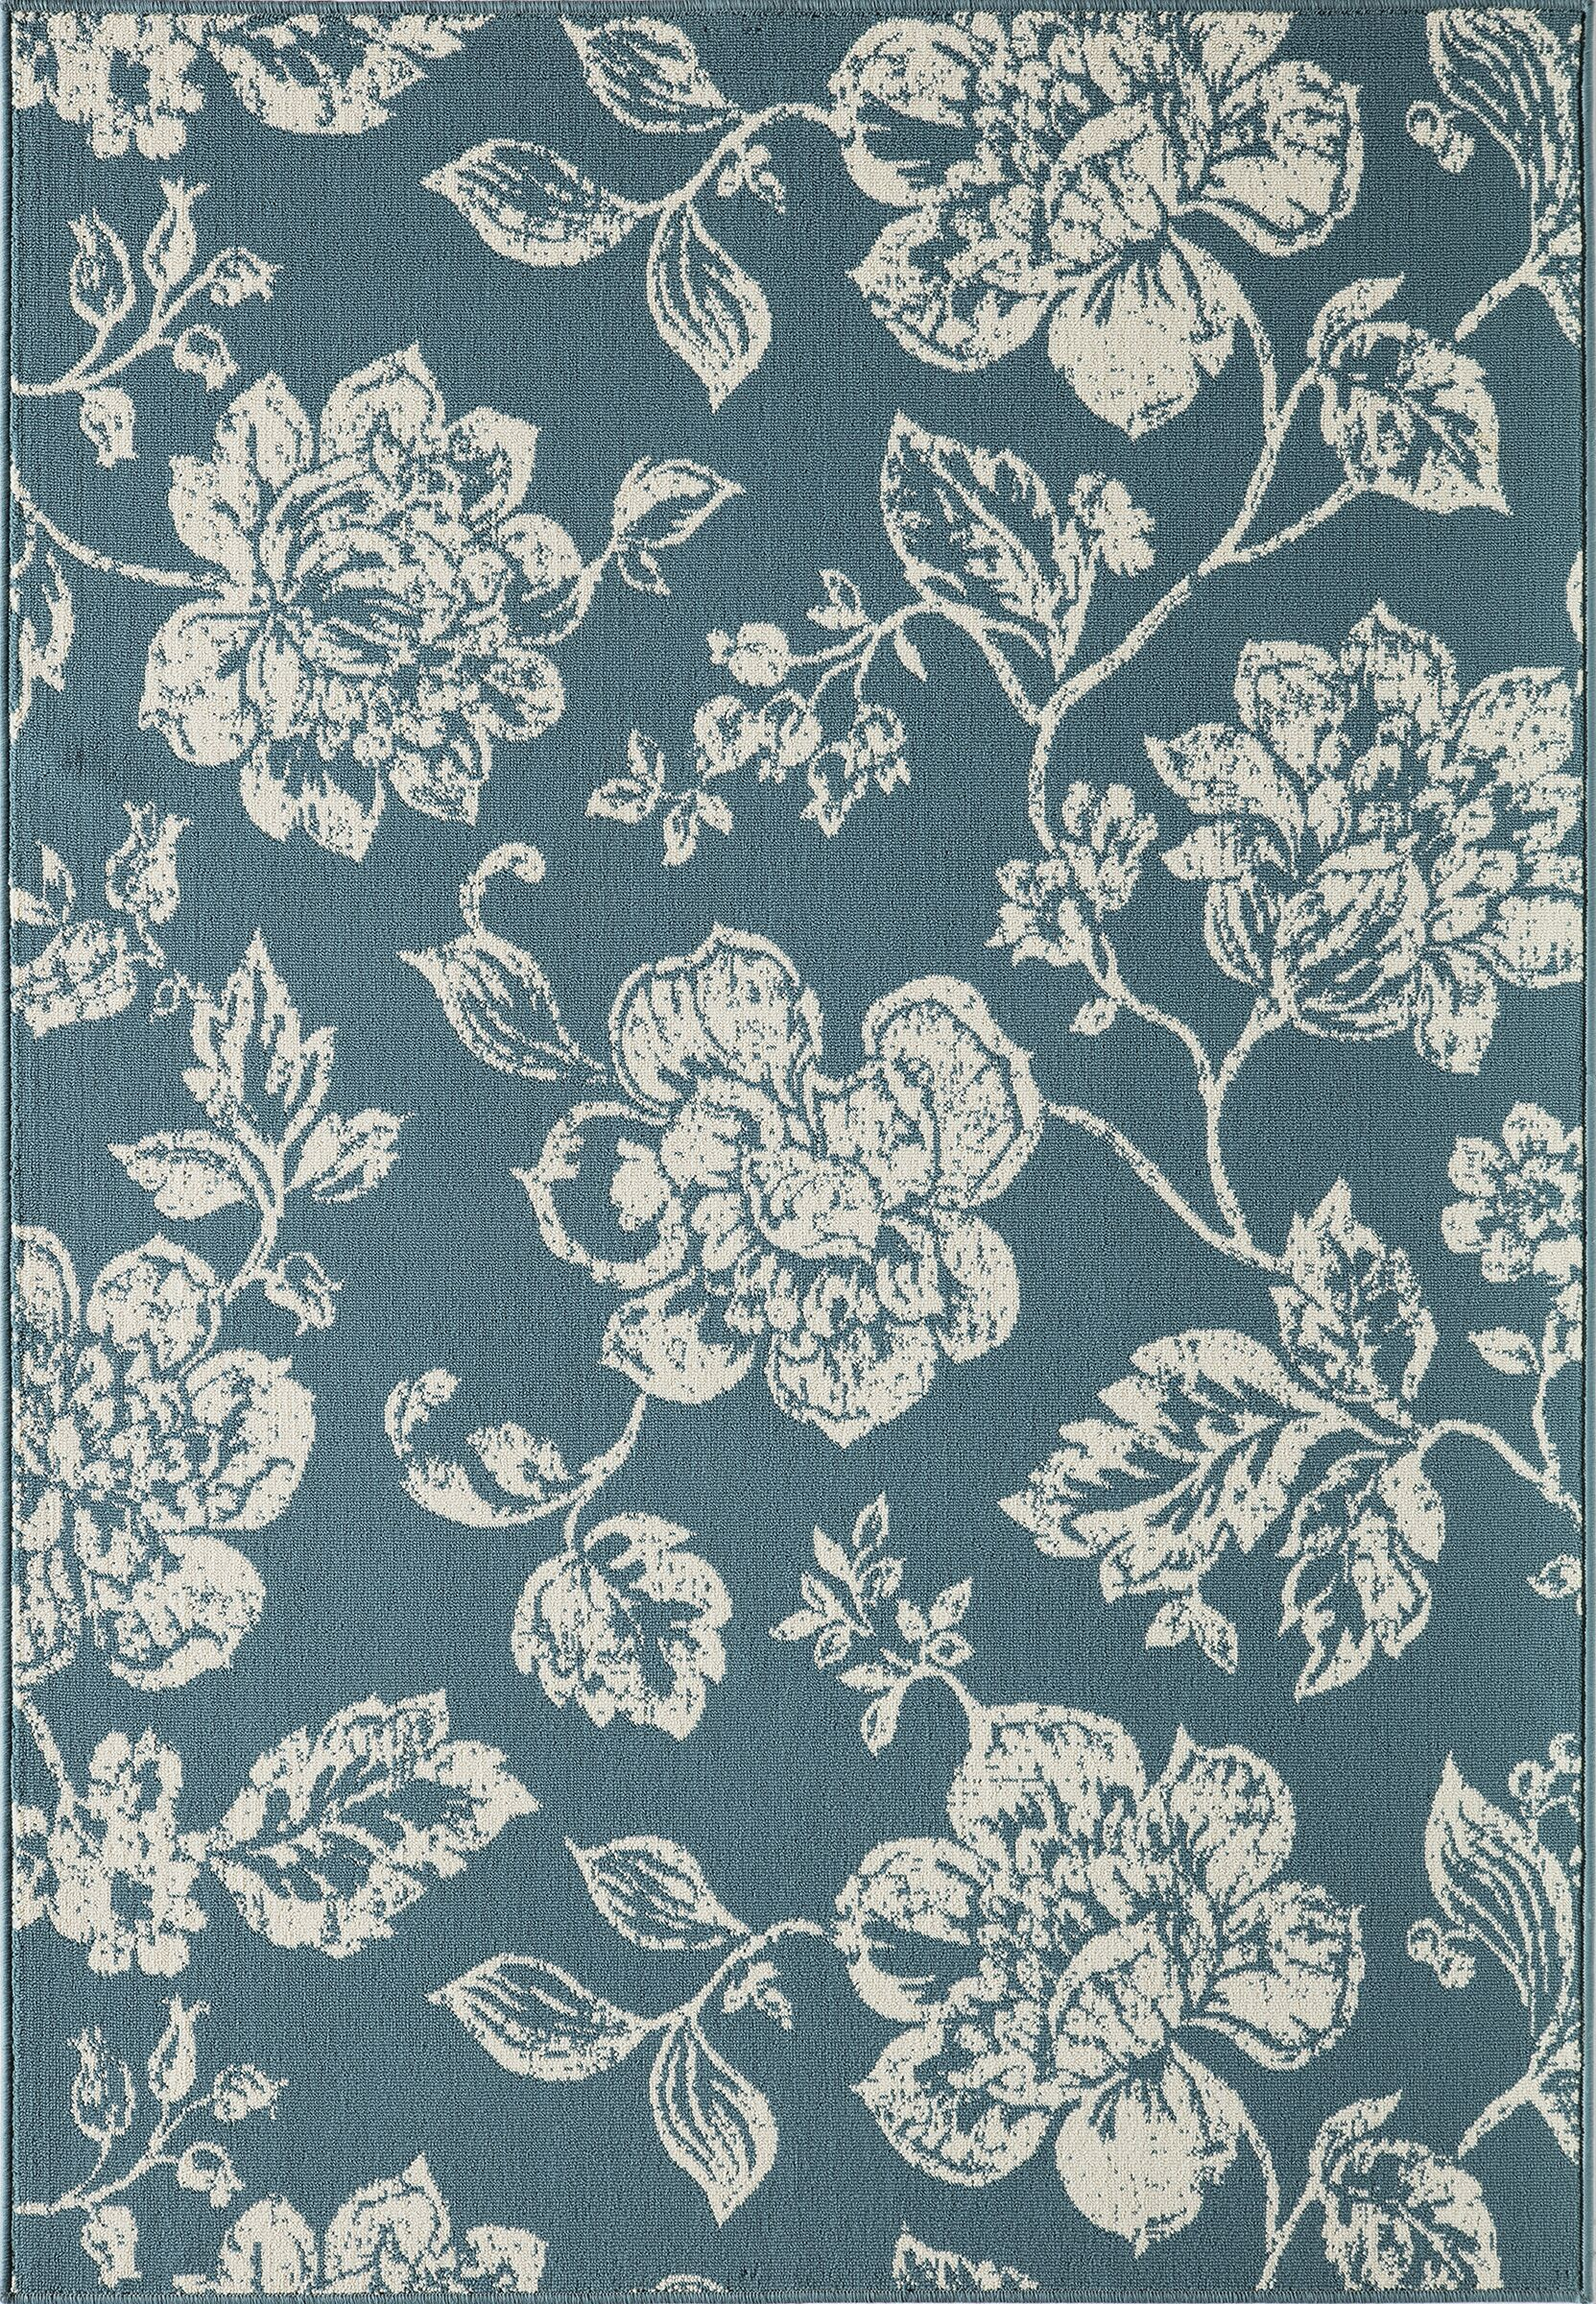 Kofi Blue/Ivory Indoor/Outdoor Area Rug Rug Size: Rectangle 5'3